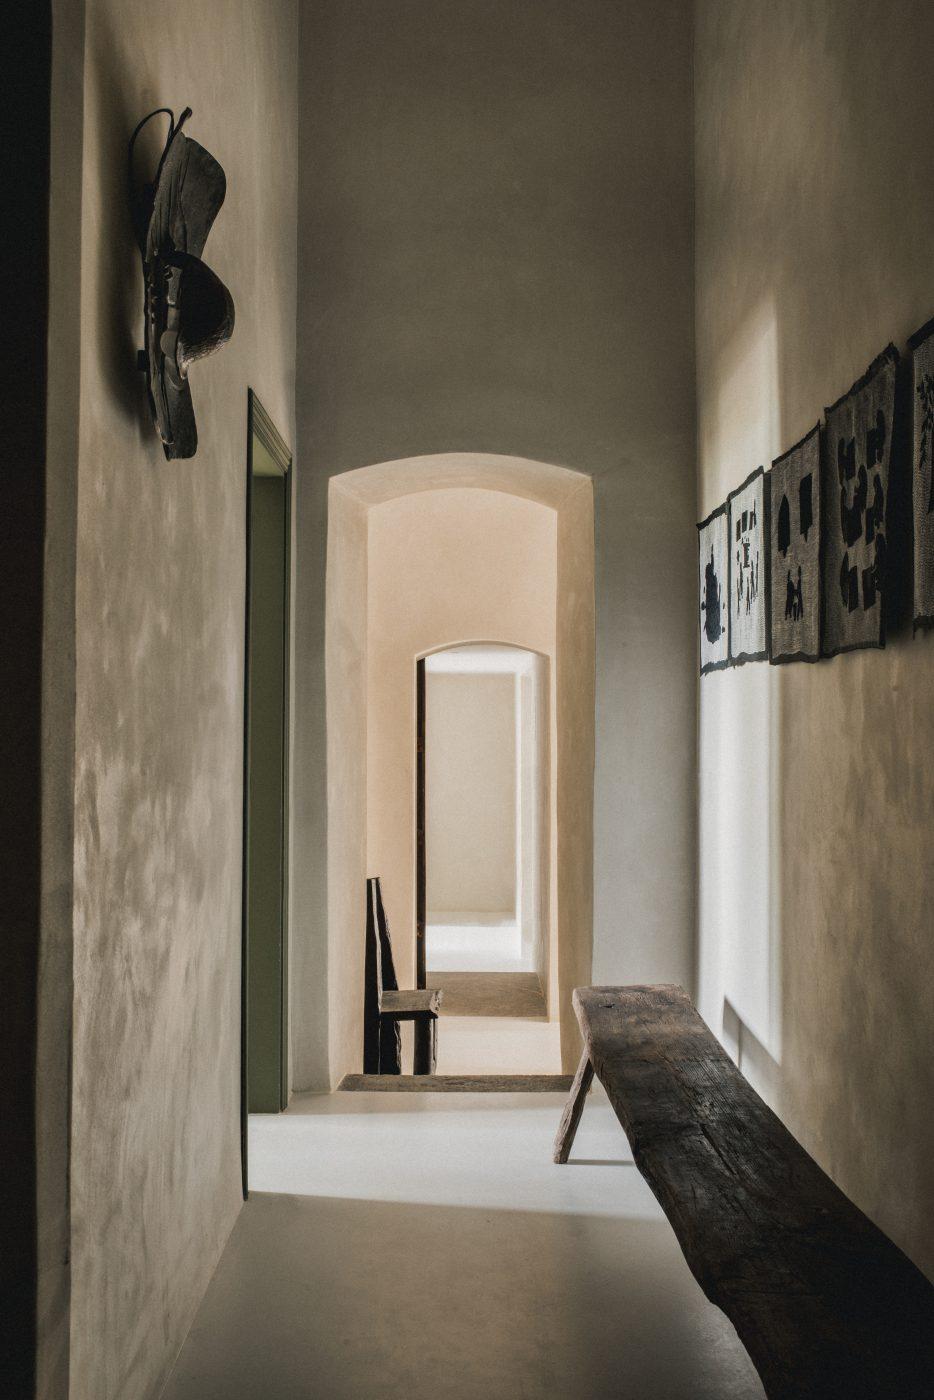 Hallway space designed by Hollie Bowden